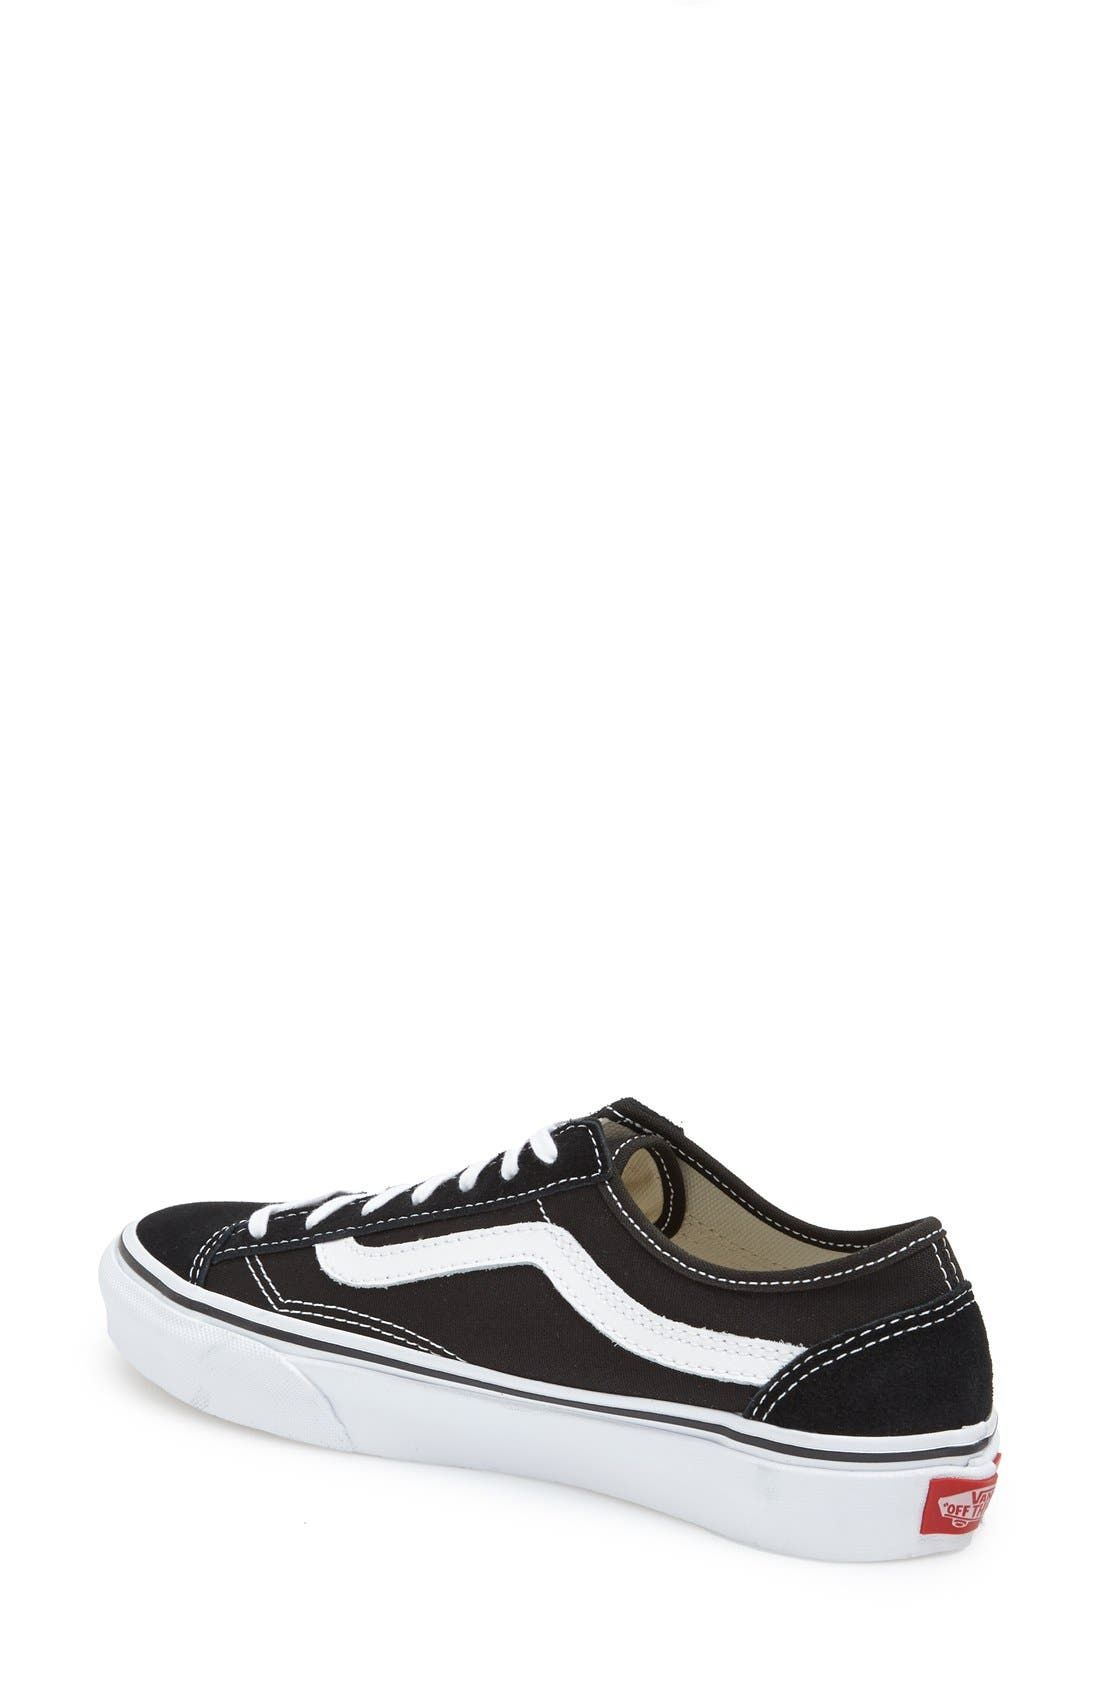 Alternate Image 2  - Vans 'Style 36' Sneaker (Women)